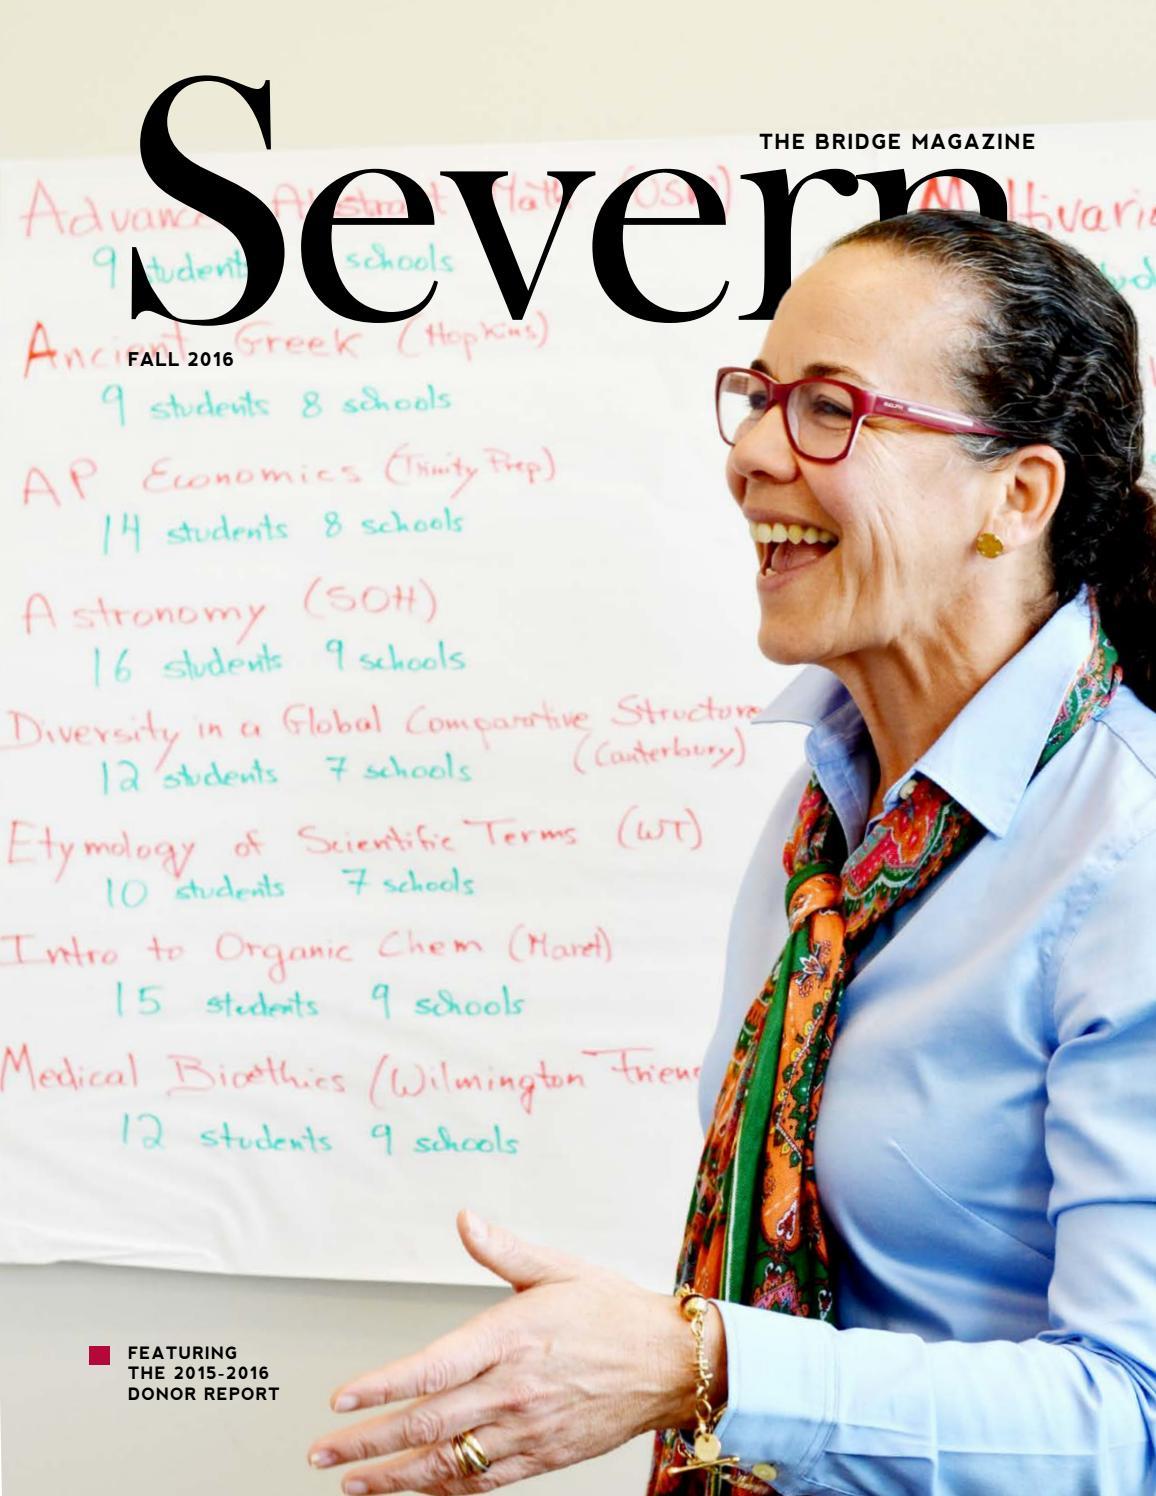 Watch Yvonne Severn video